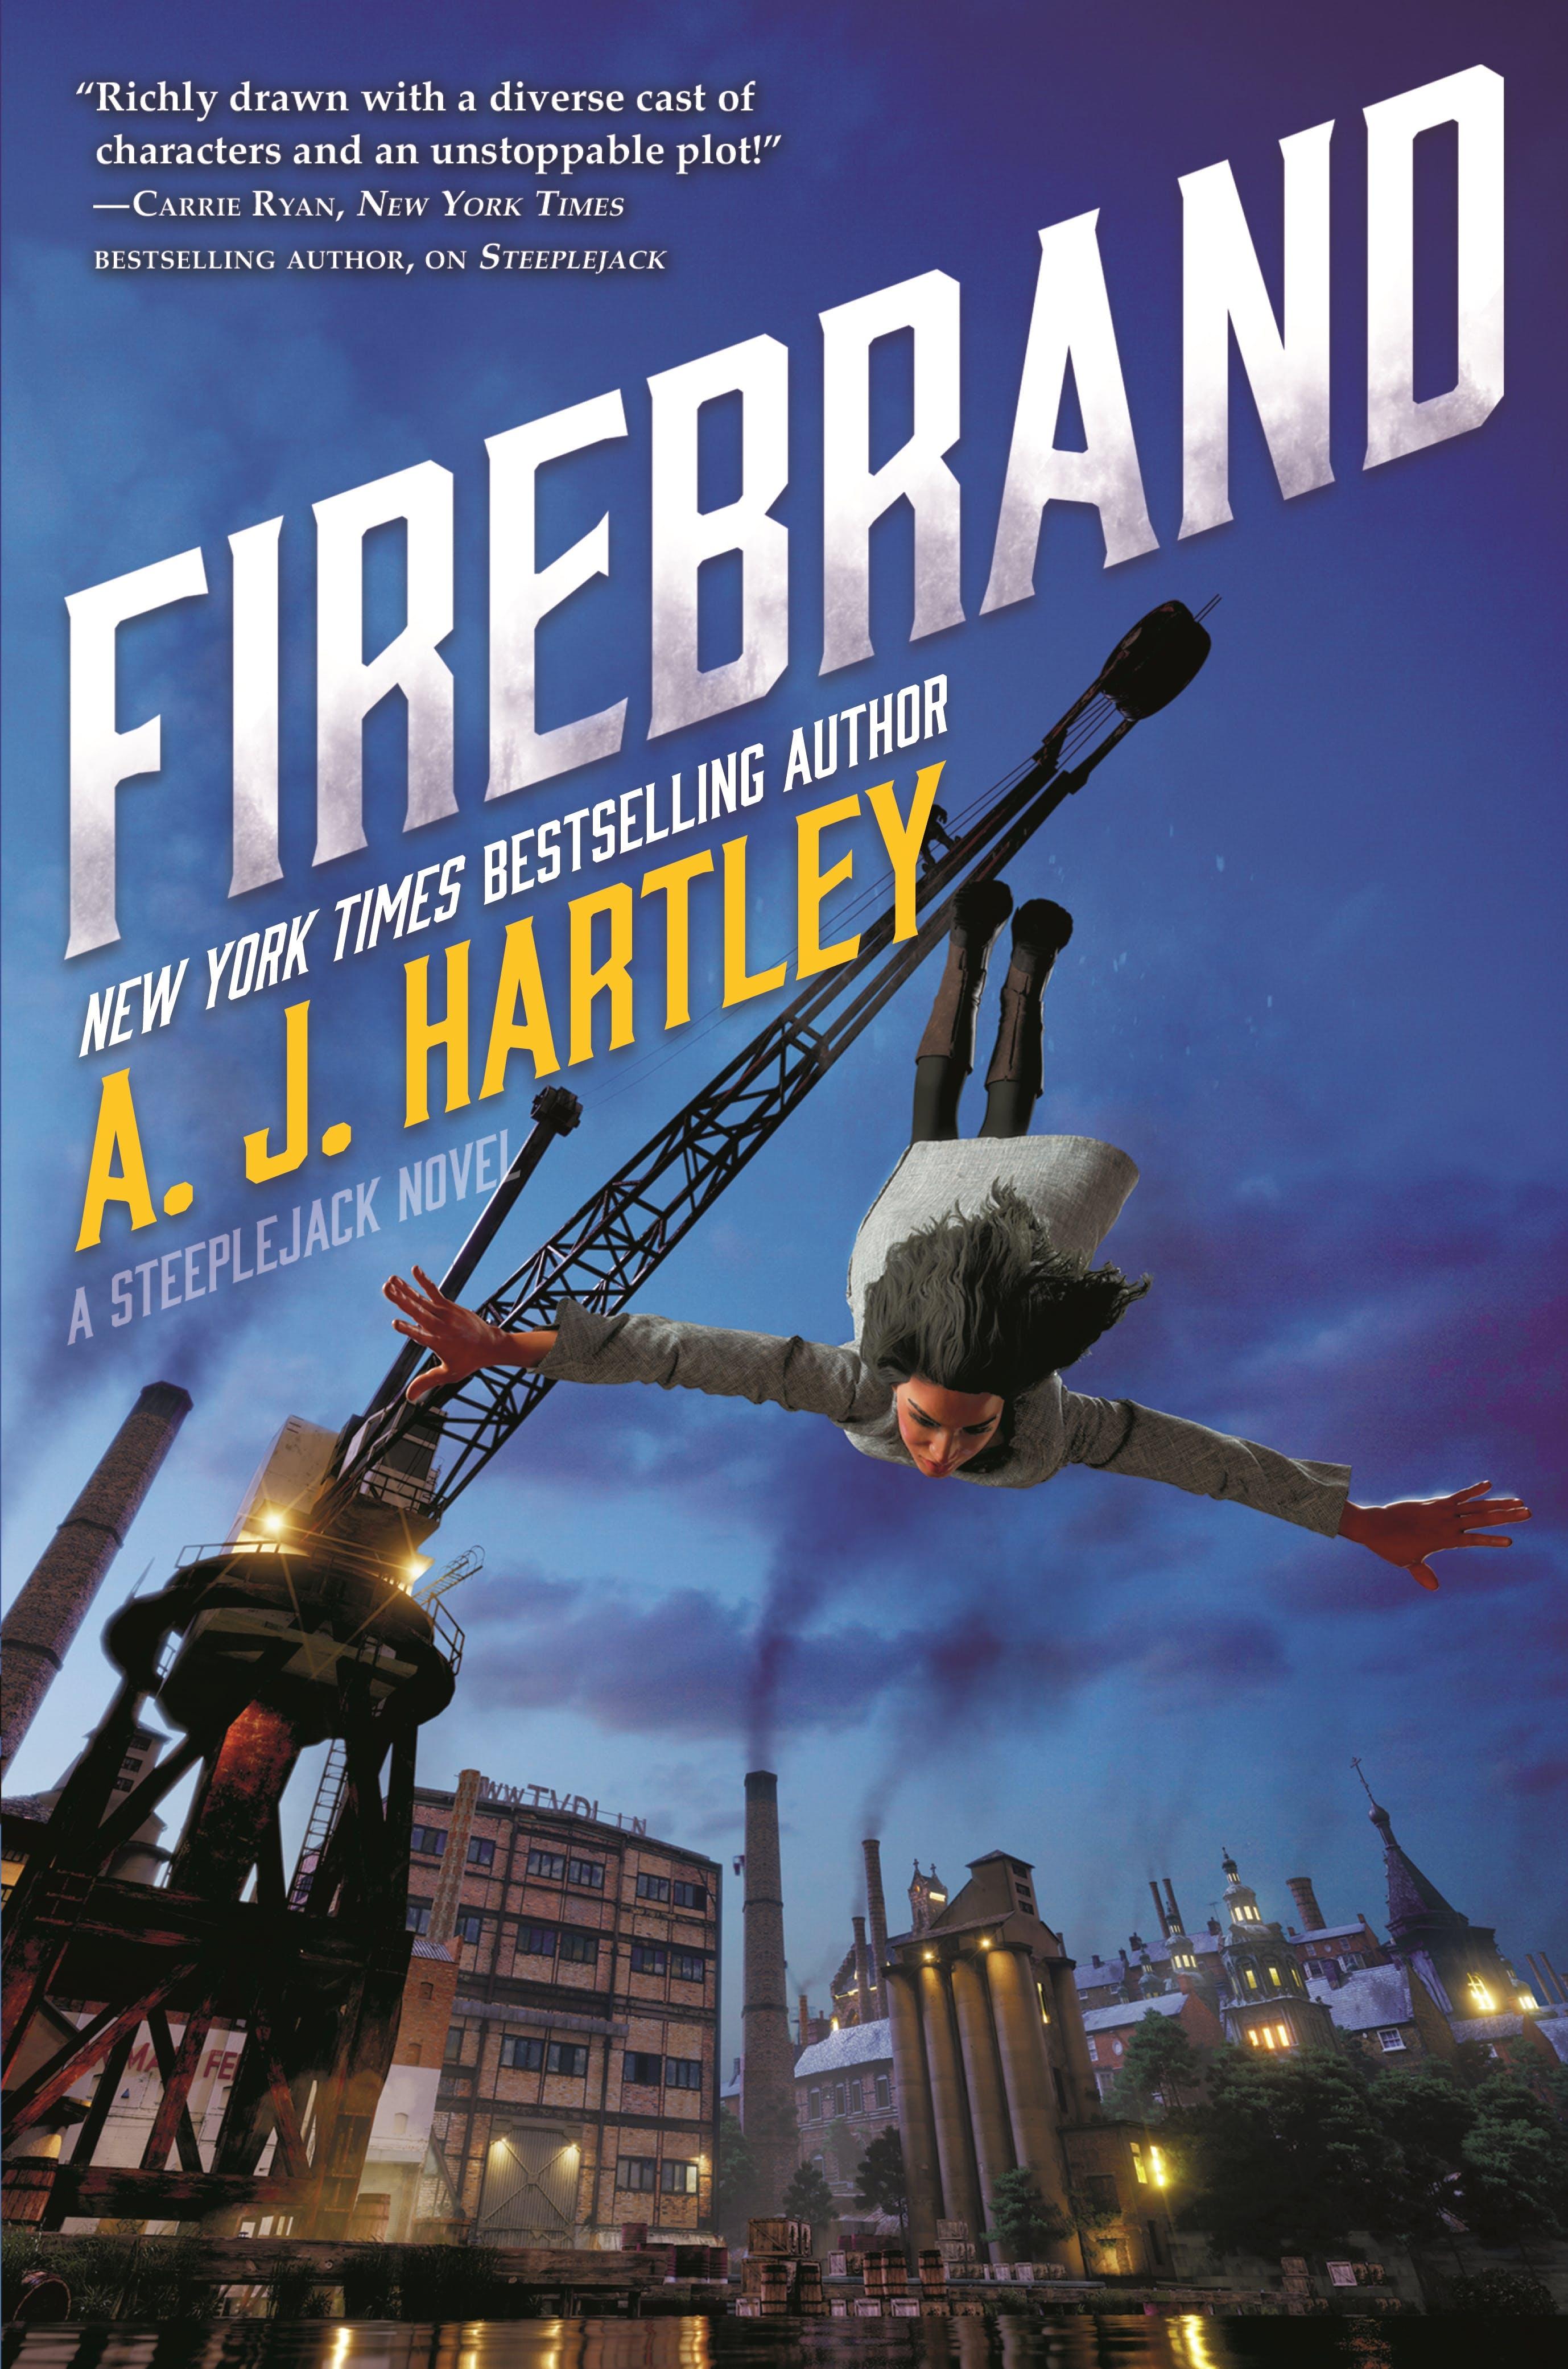 Image of Firebrand